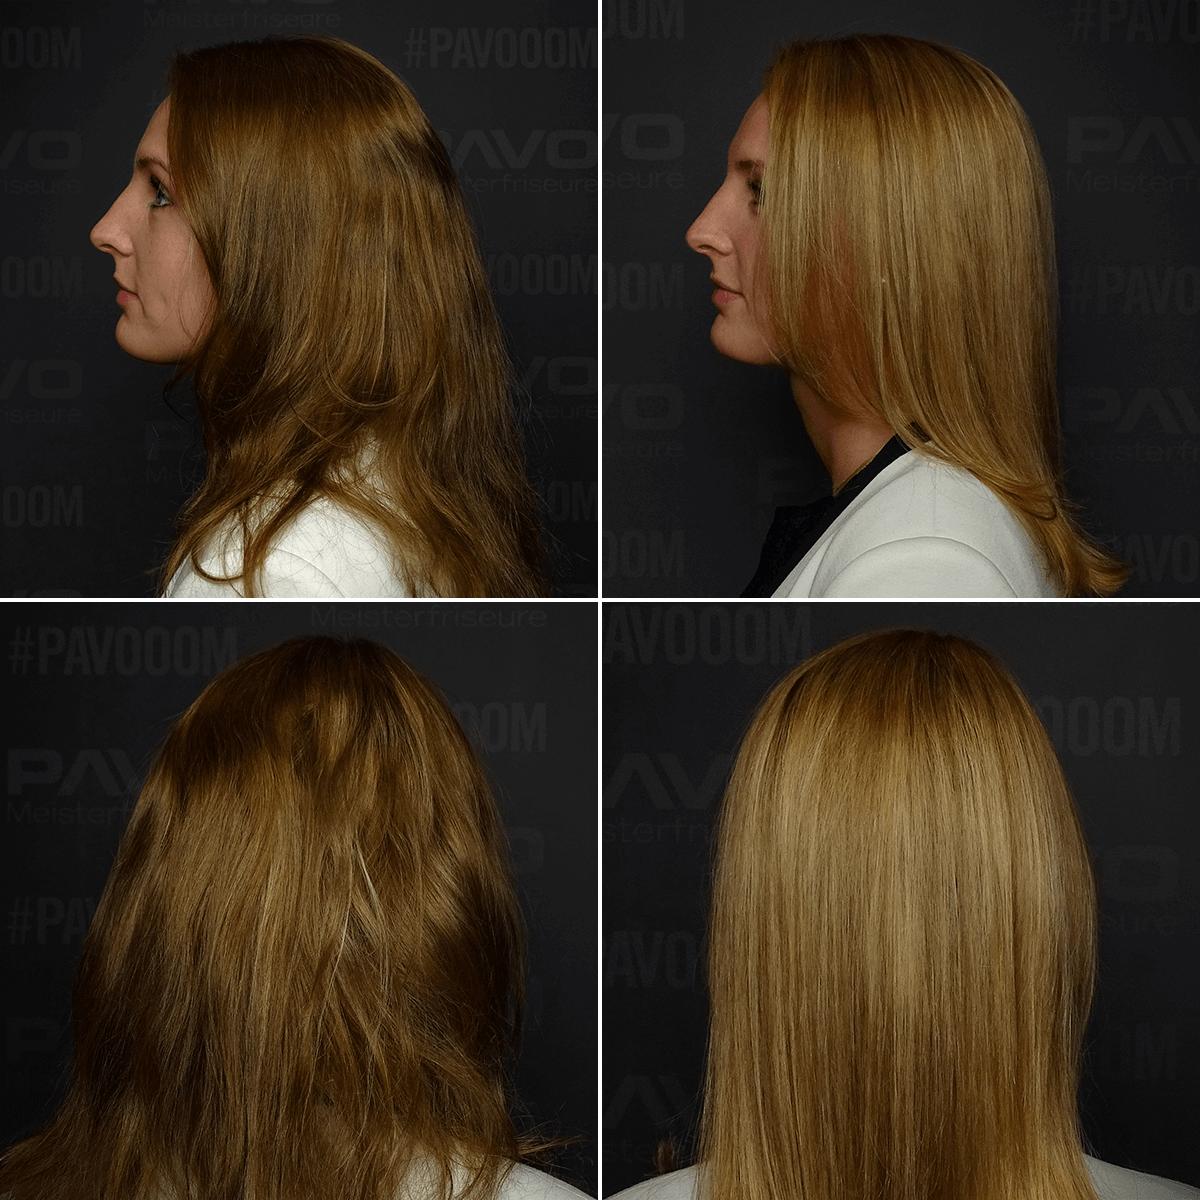 Guter Friseur In Essen Pavo Friseure Cover Up Von Seda